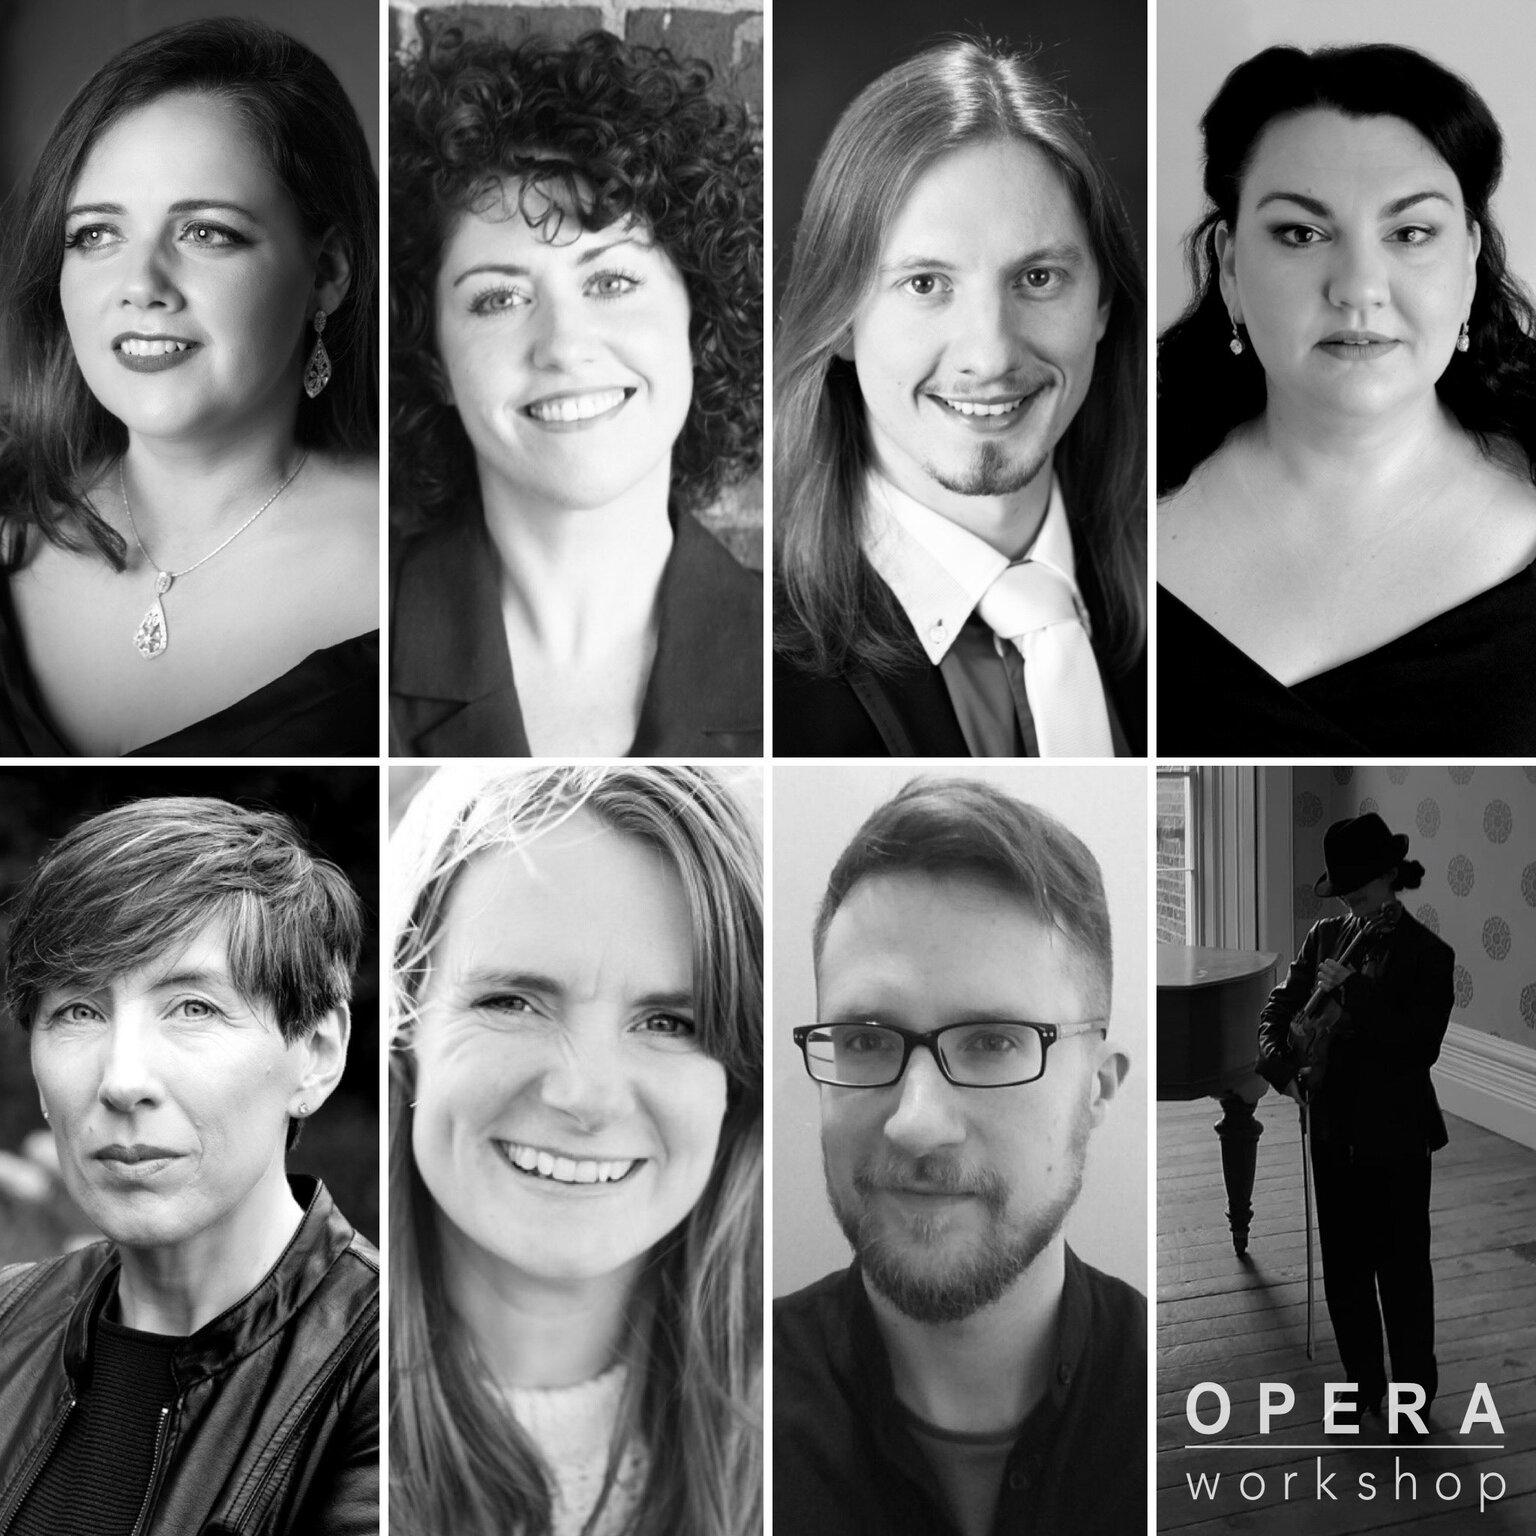 opera workshop limerick